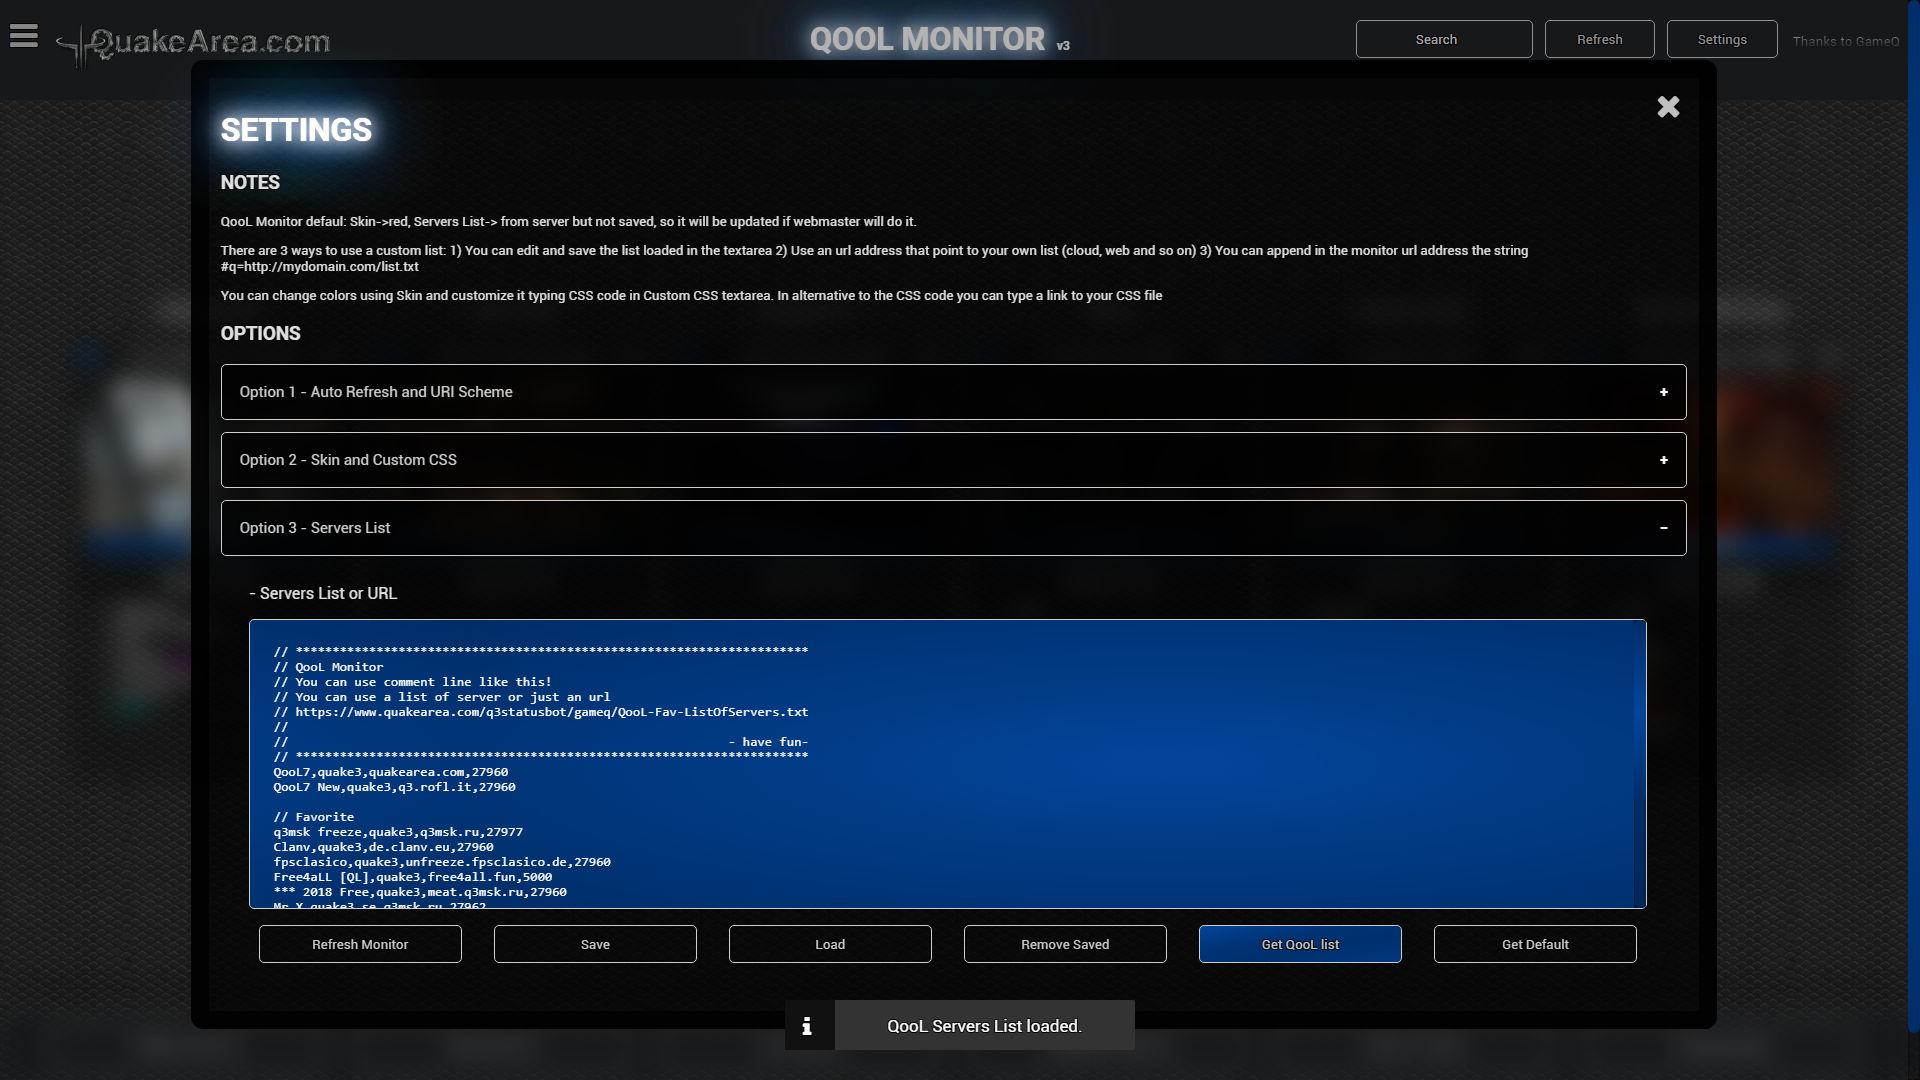 Quakearea - QooL Monitor Review